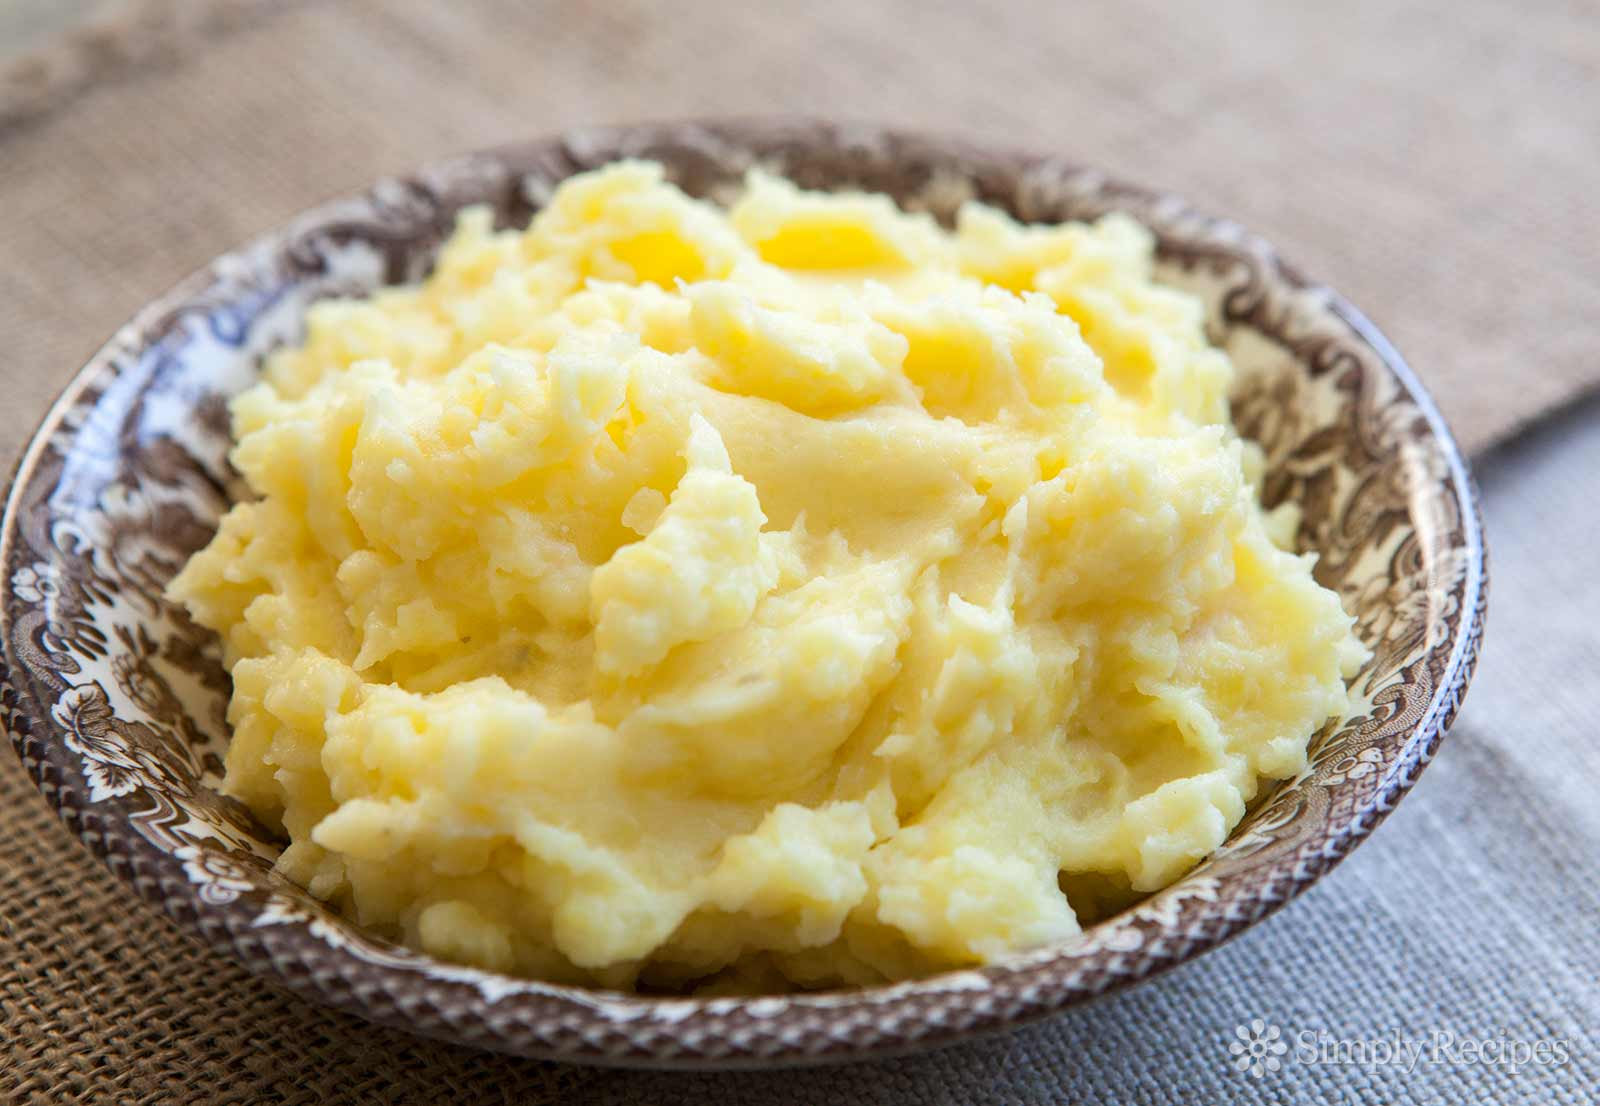 Puré de patatas perfectas